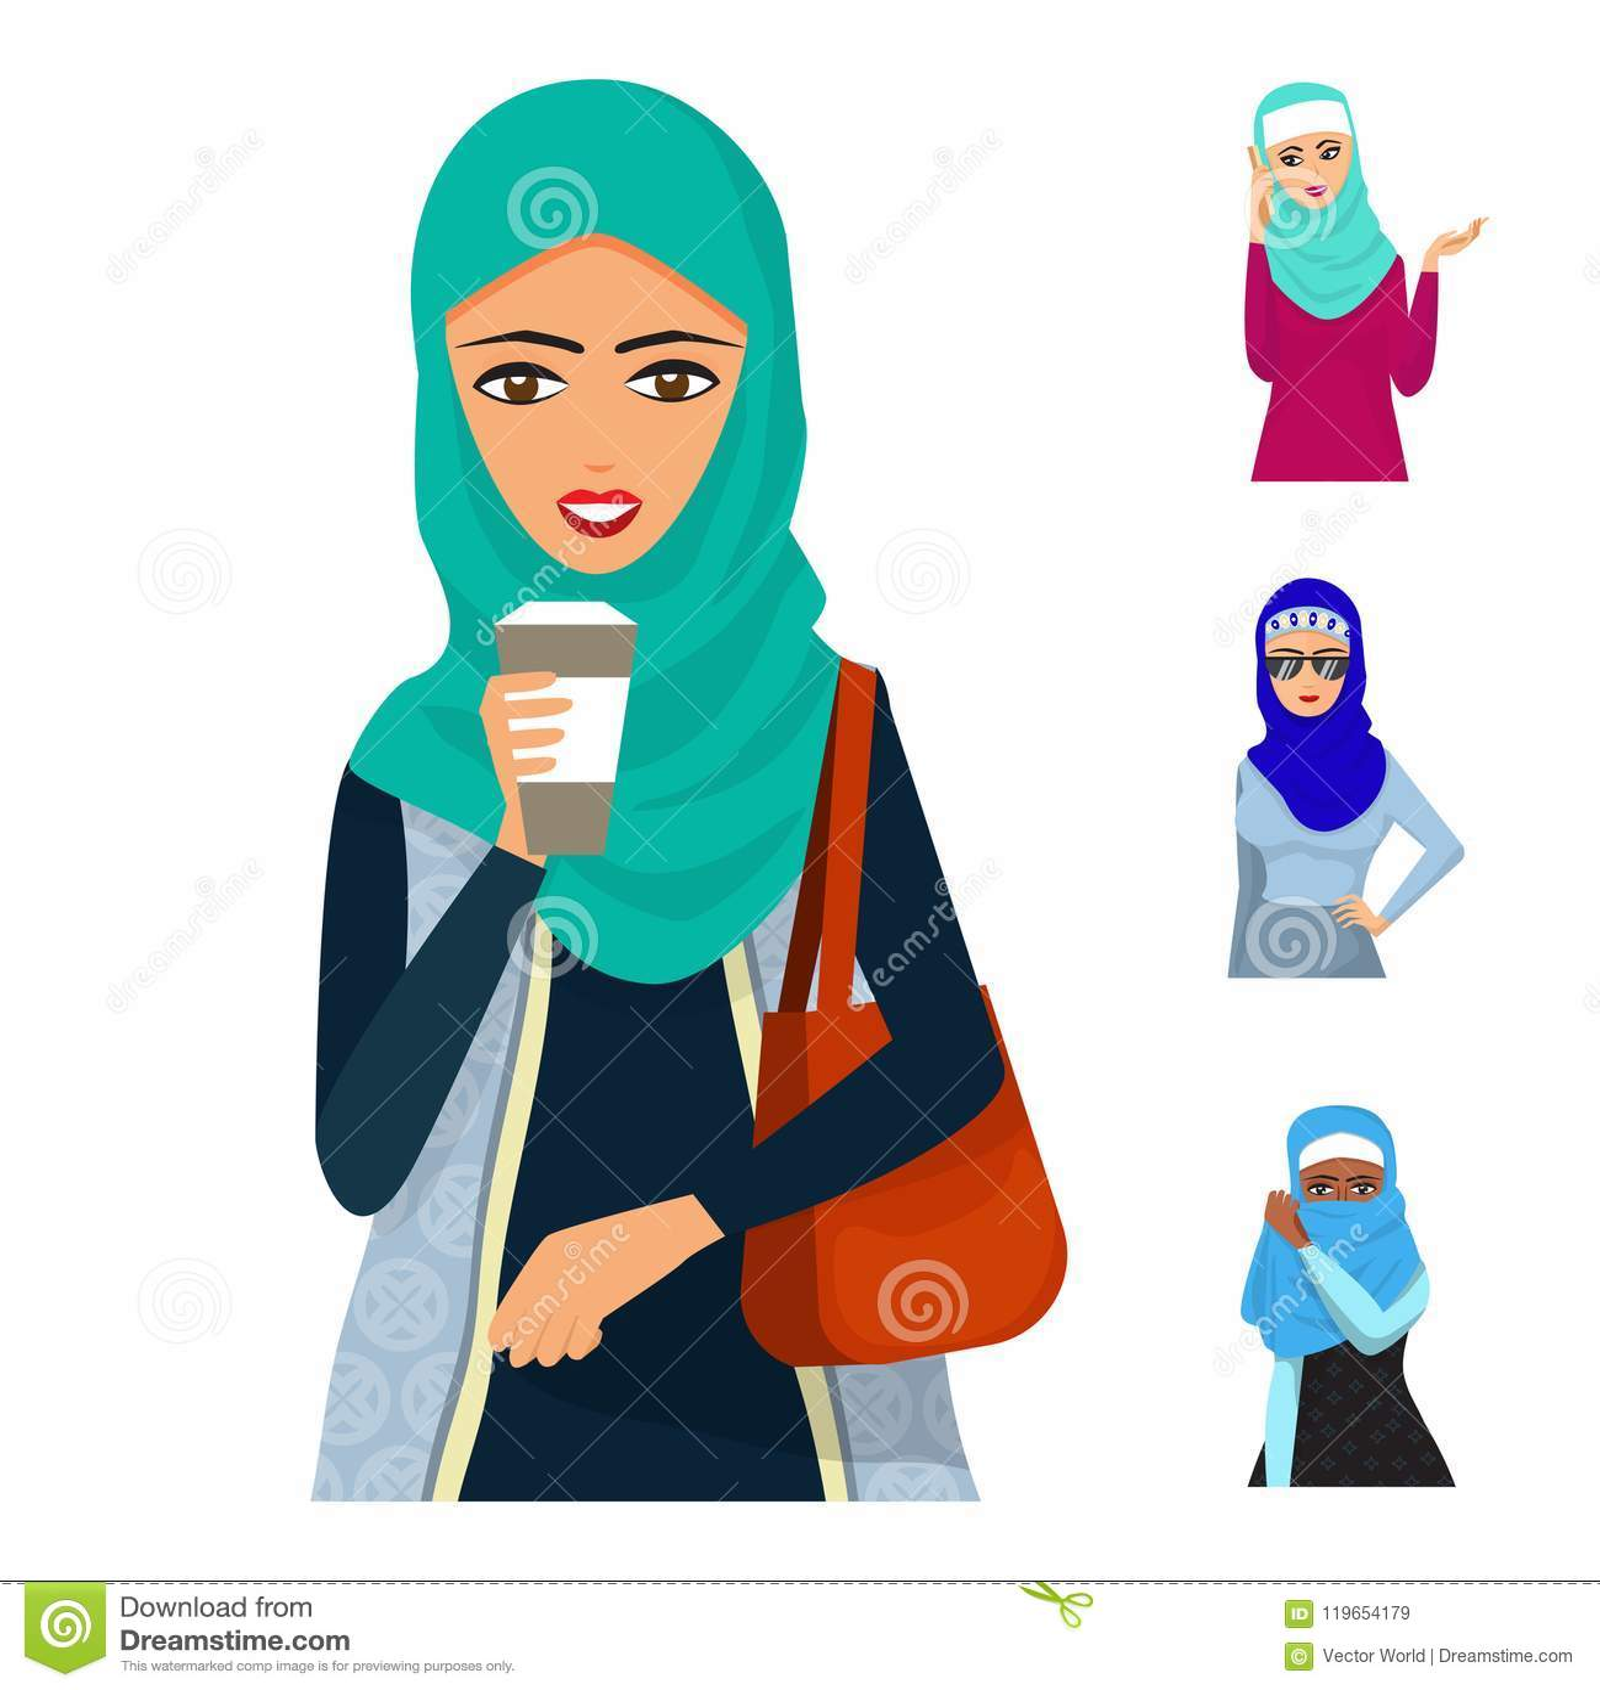 Arabic Woman Adult Character Arabian Asia Nationality Islamic Girl Face Hijab Vector Illustration